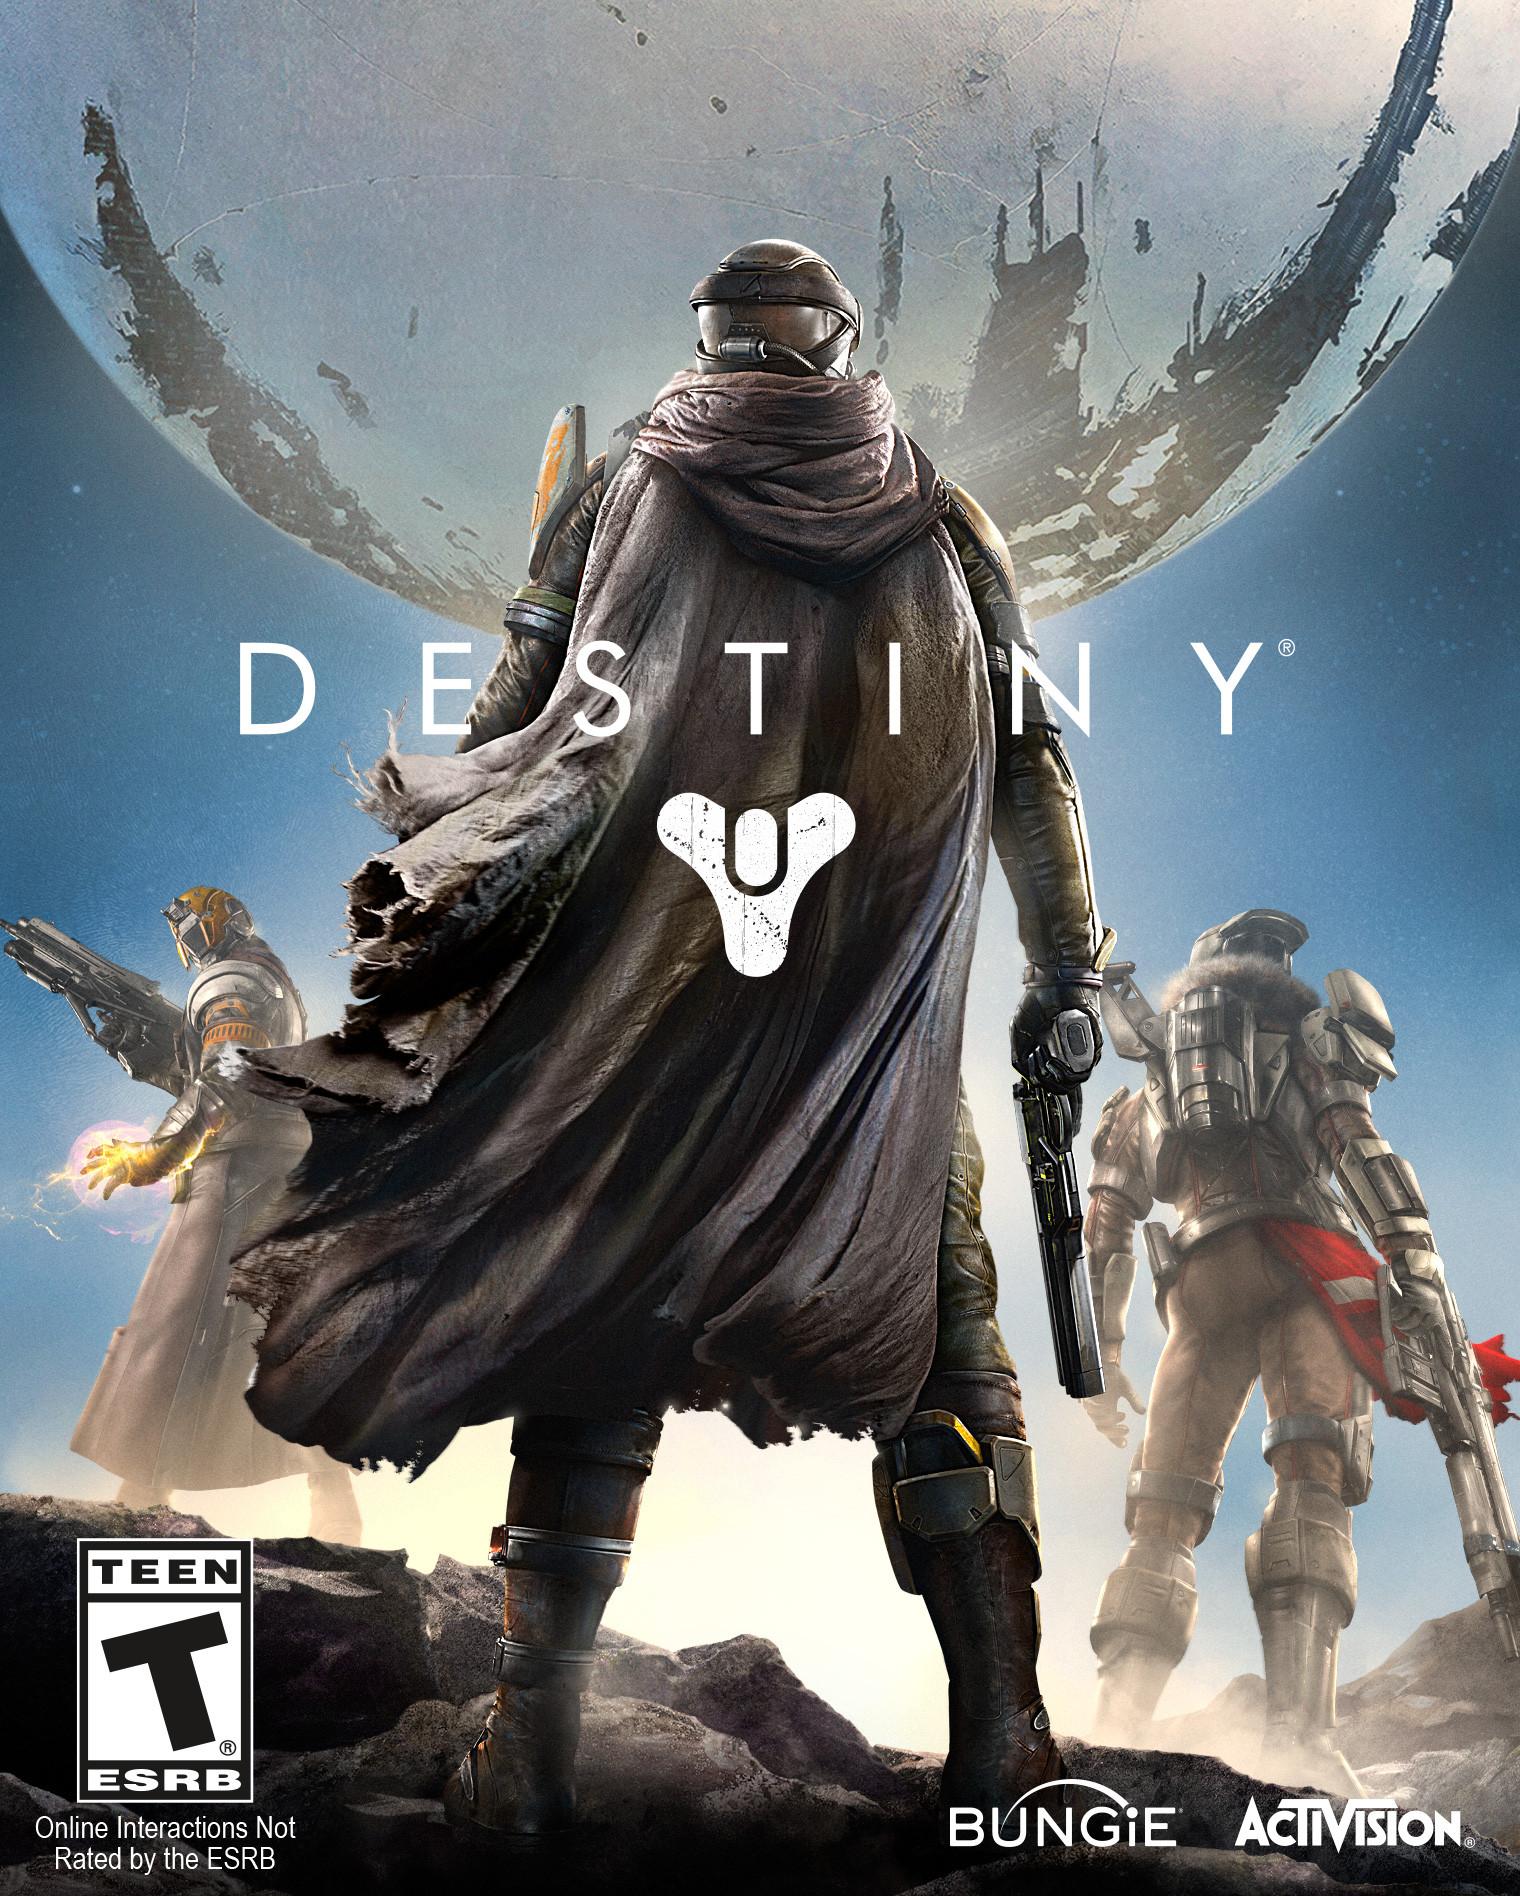 c7def51e300 Destiny (Video Game 2014) - IMDb